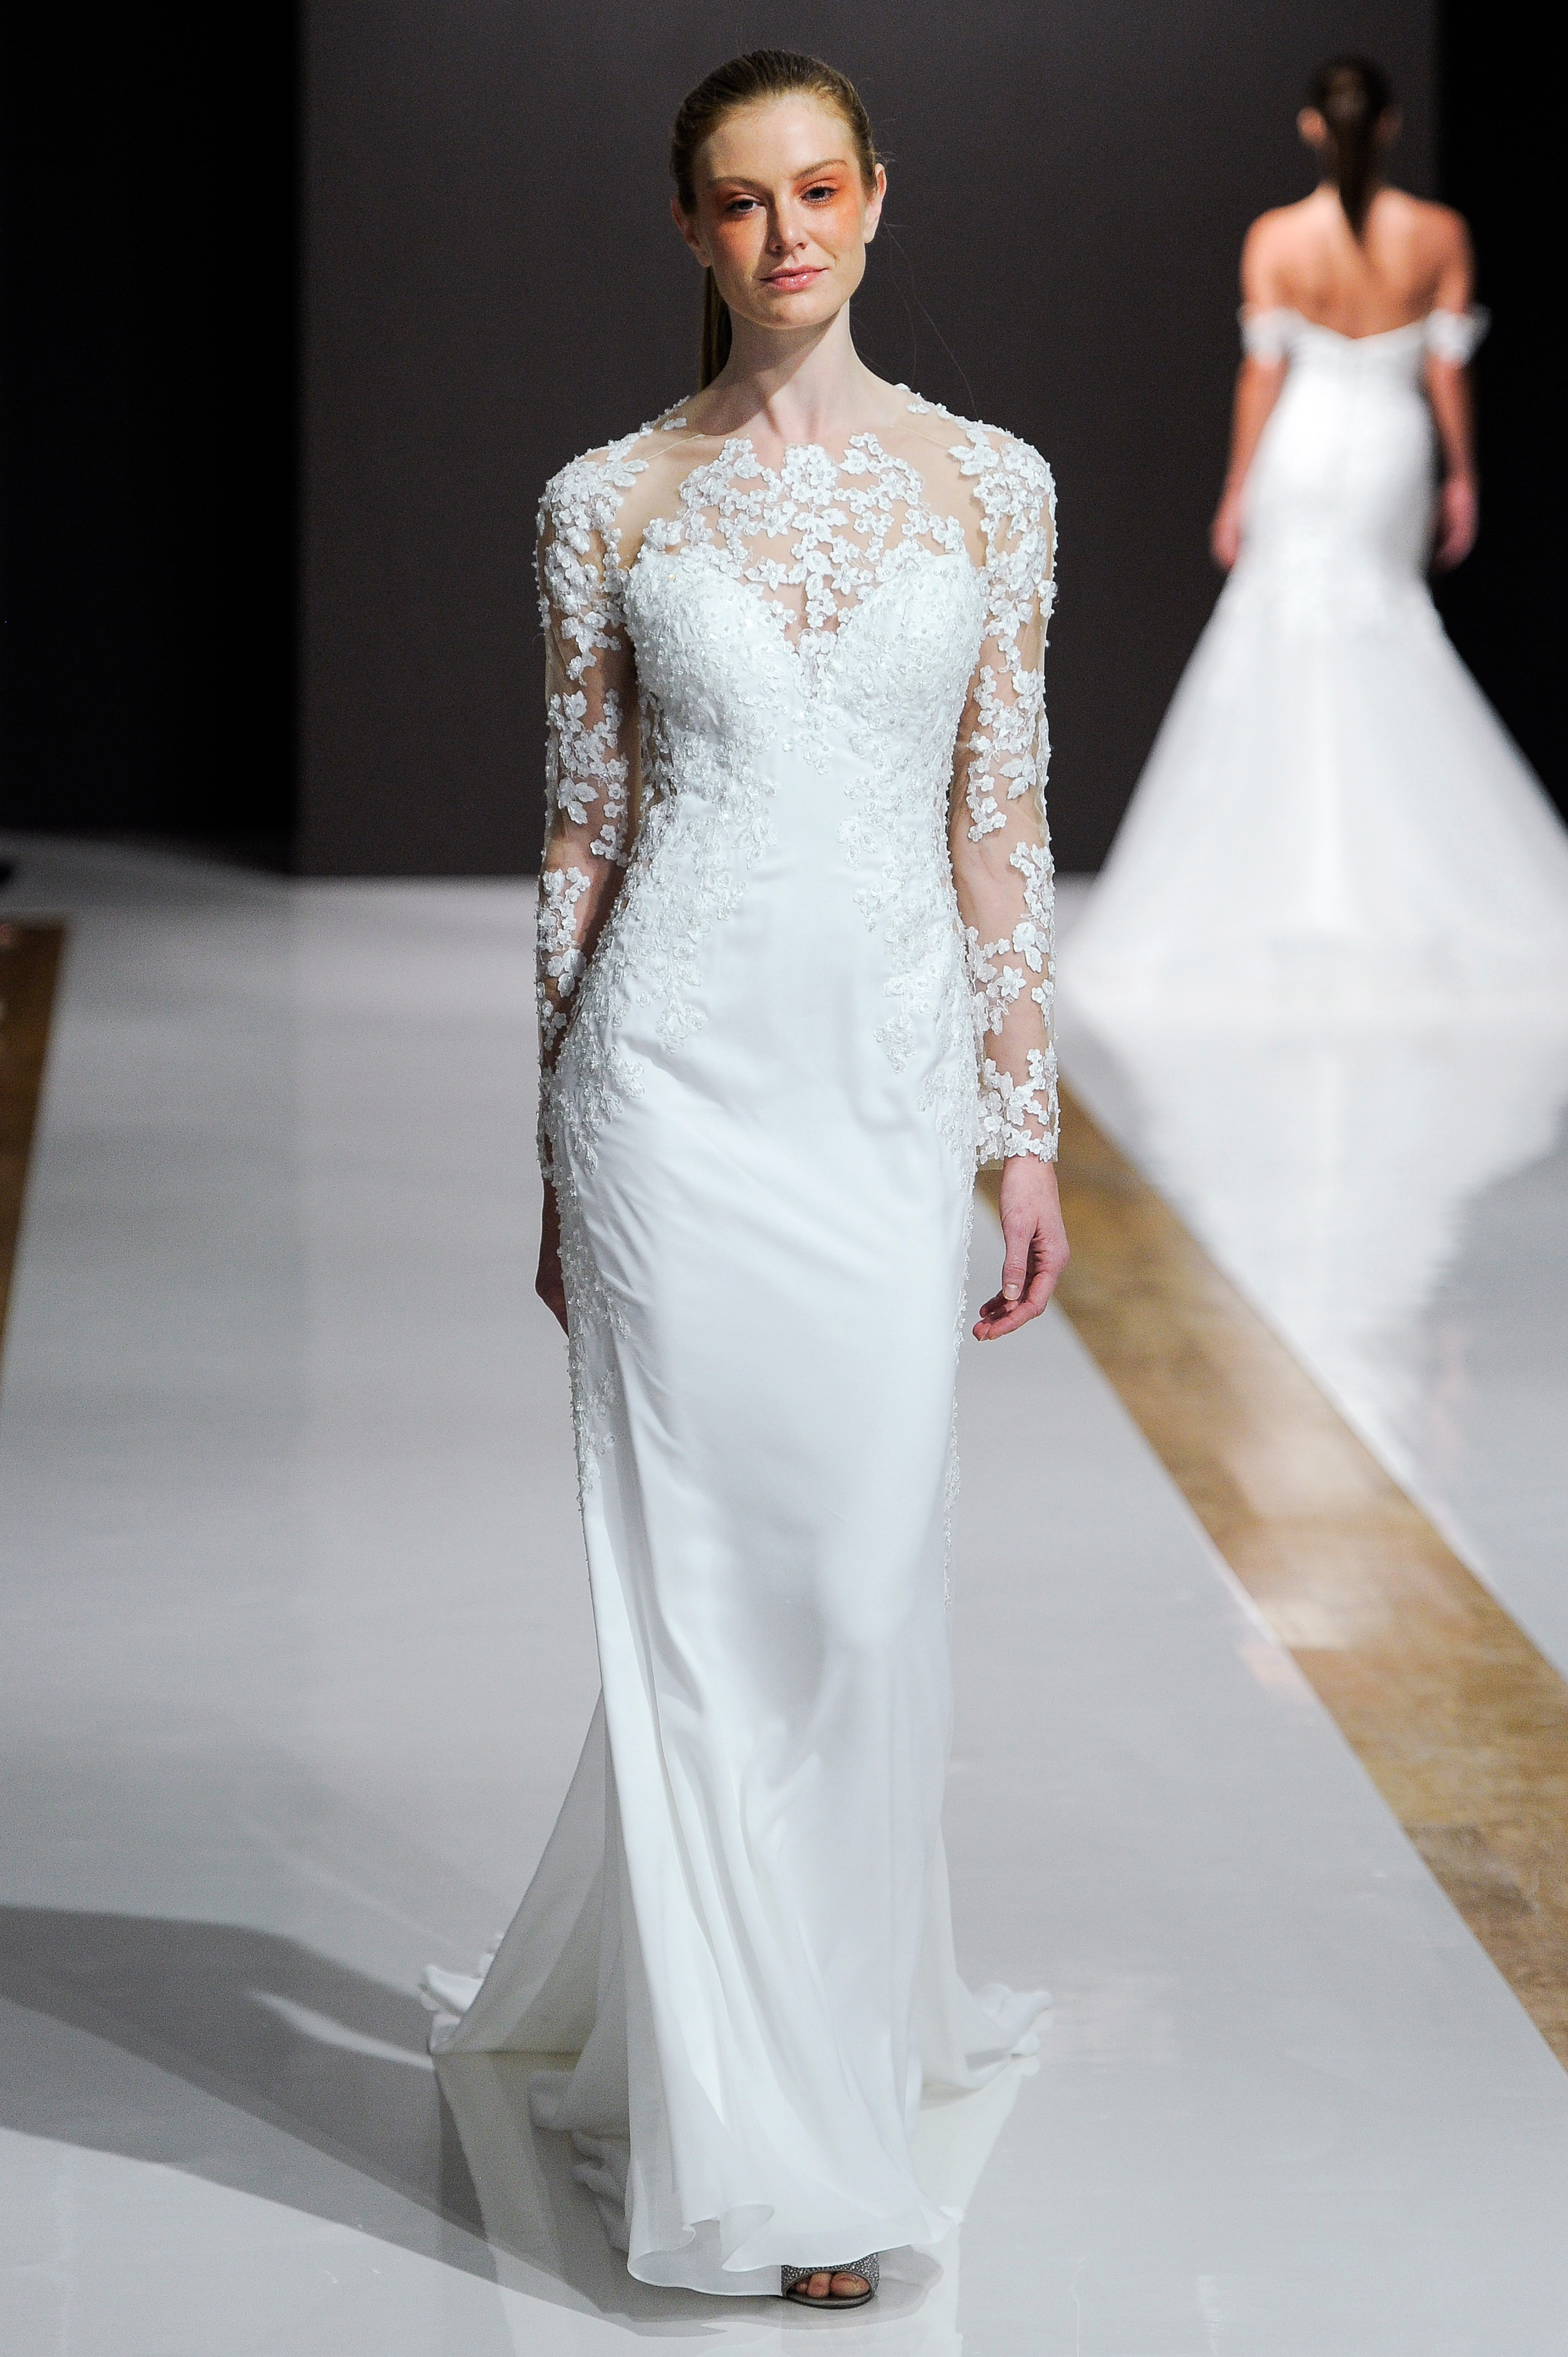 mark zunino wedding dress fall 2018 long sleeves illusion neckline column